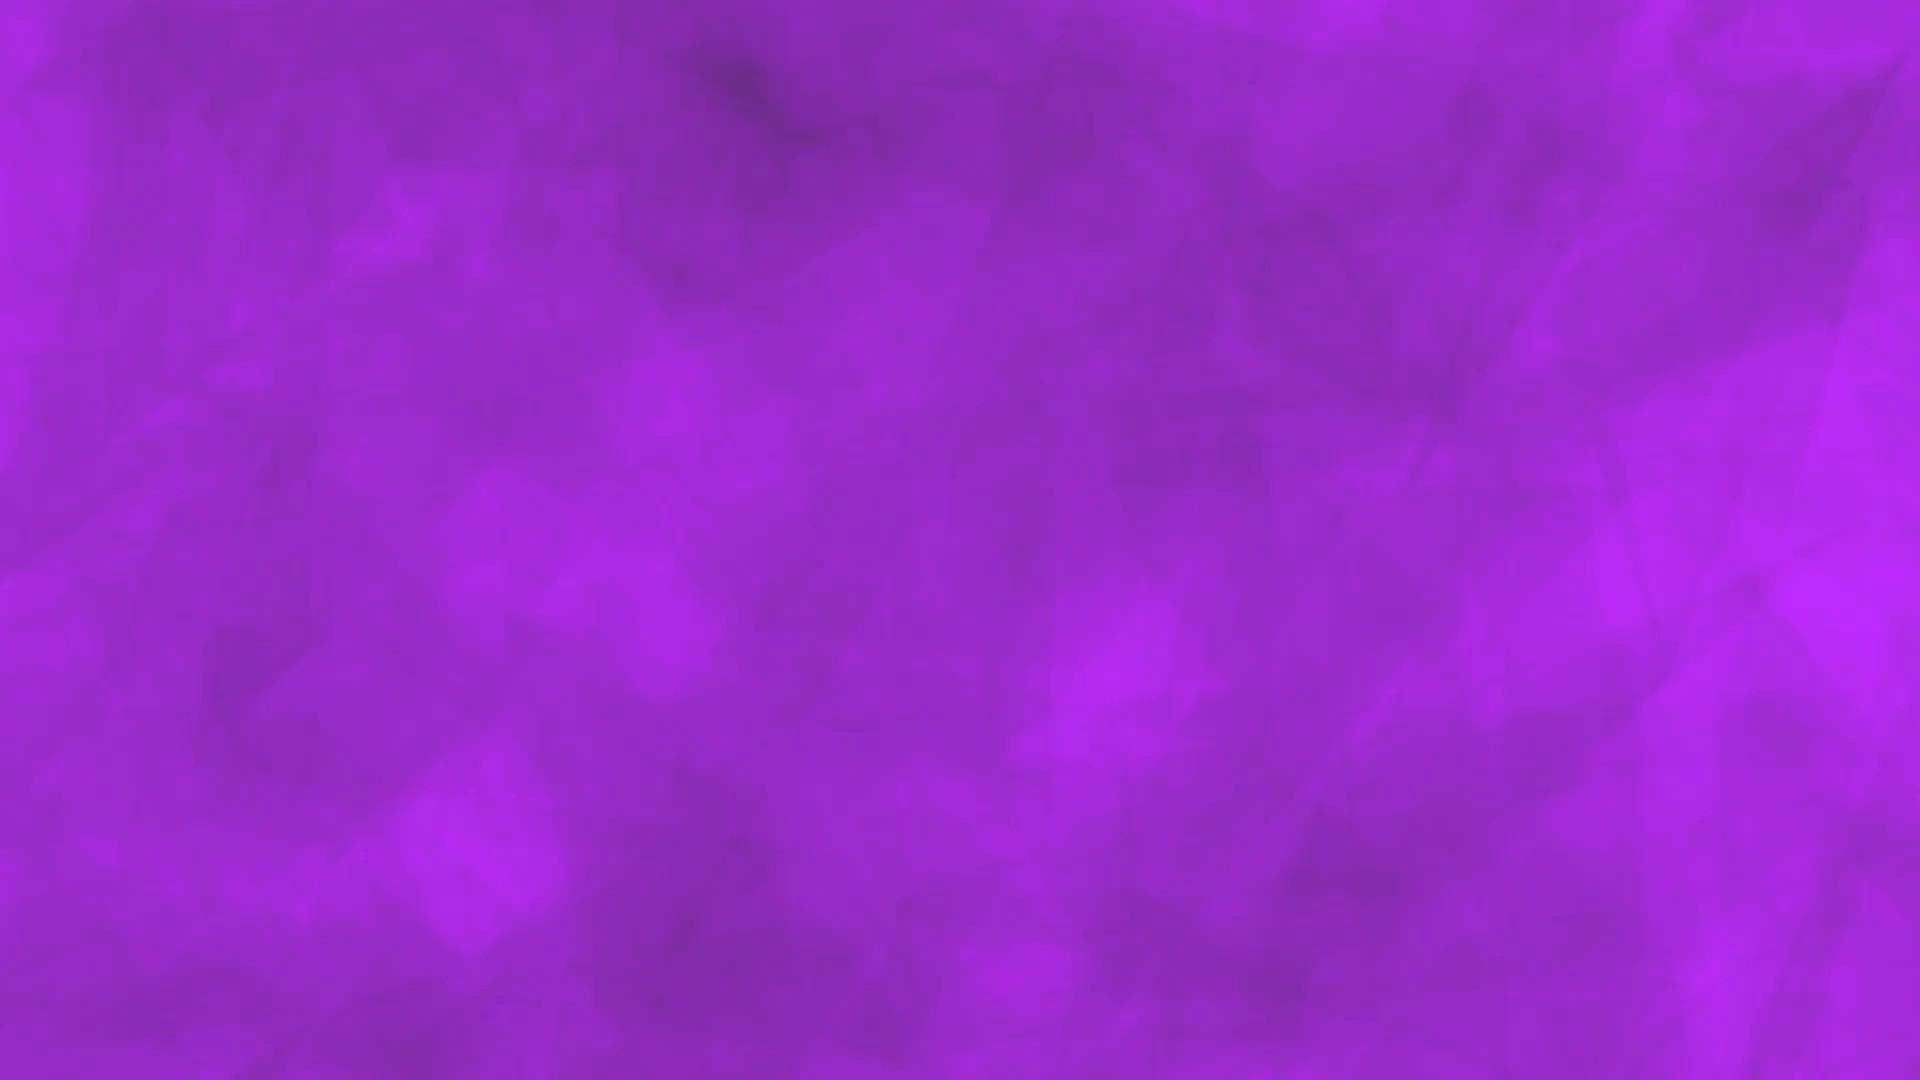 Crystalline motion background – Crystalized movement – Ice sheets –  Purple/violet/lavender Motion Background – VideoBlocks